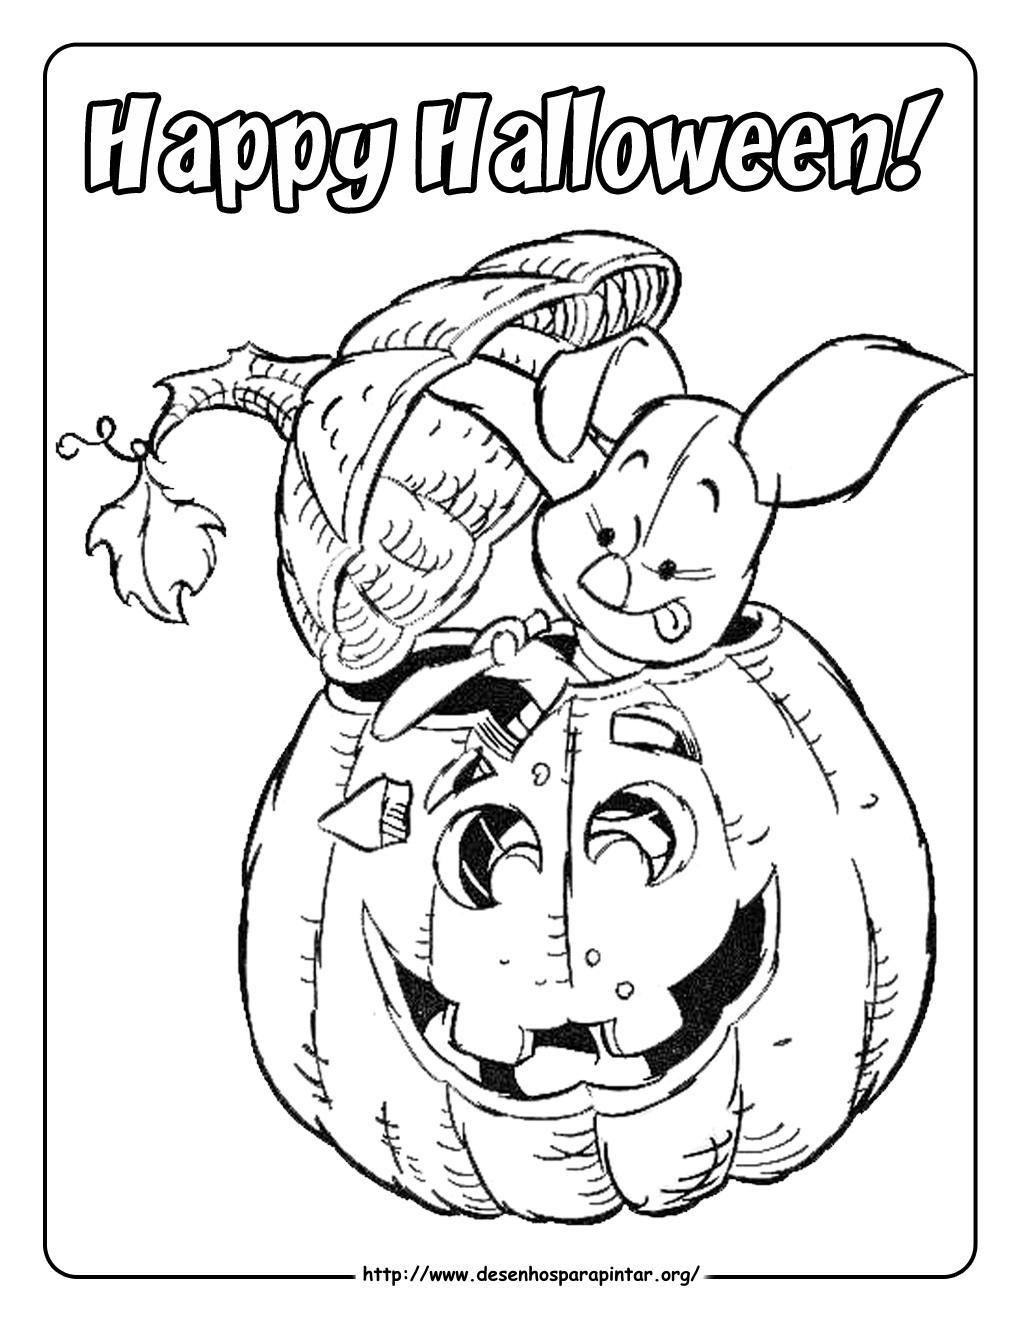 Cabecas De Abobora Para Imprimir Pintar E Colorir Neste Halloween